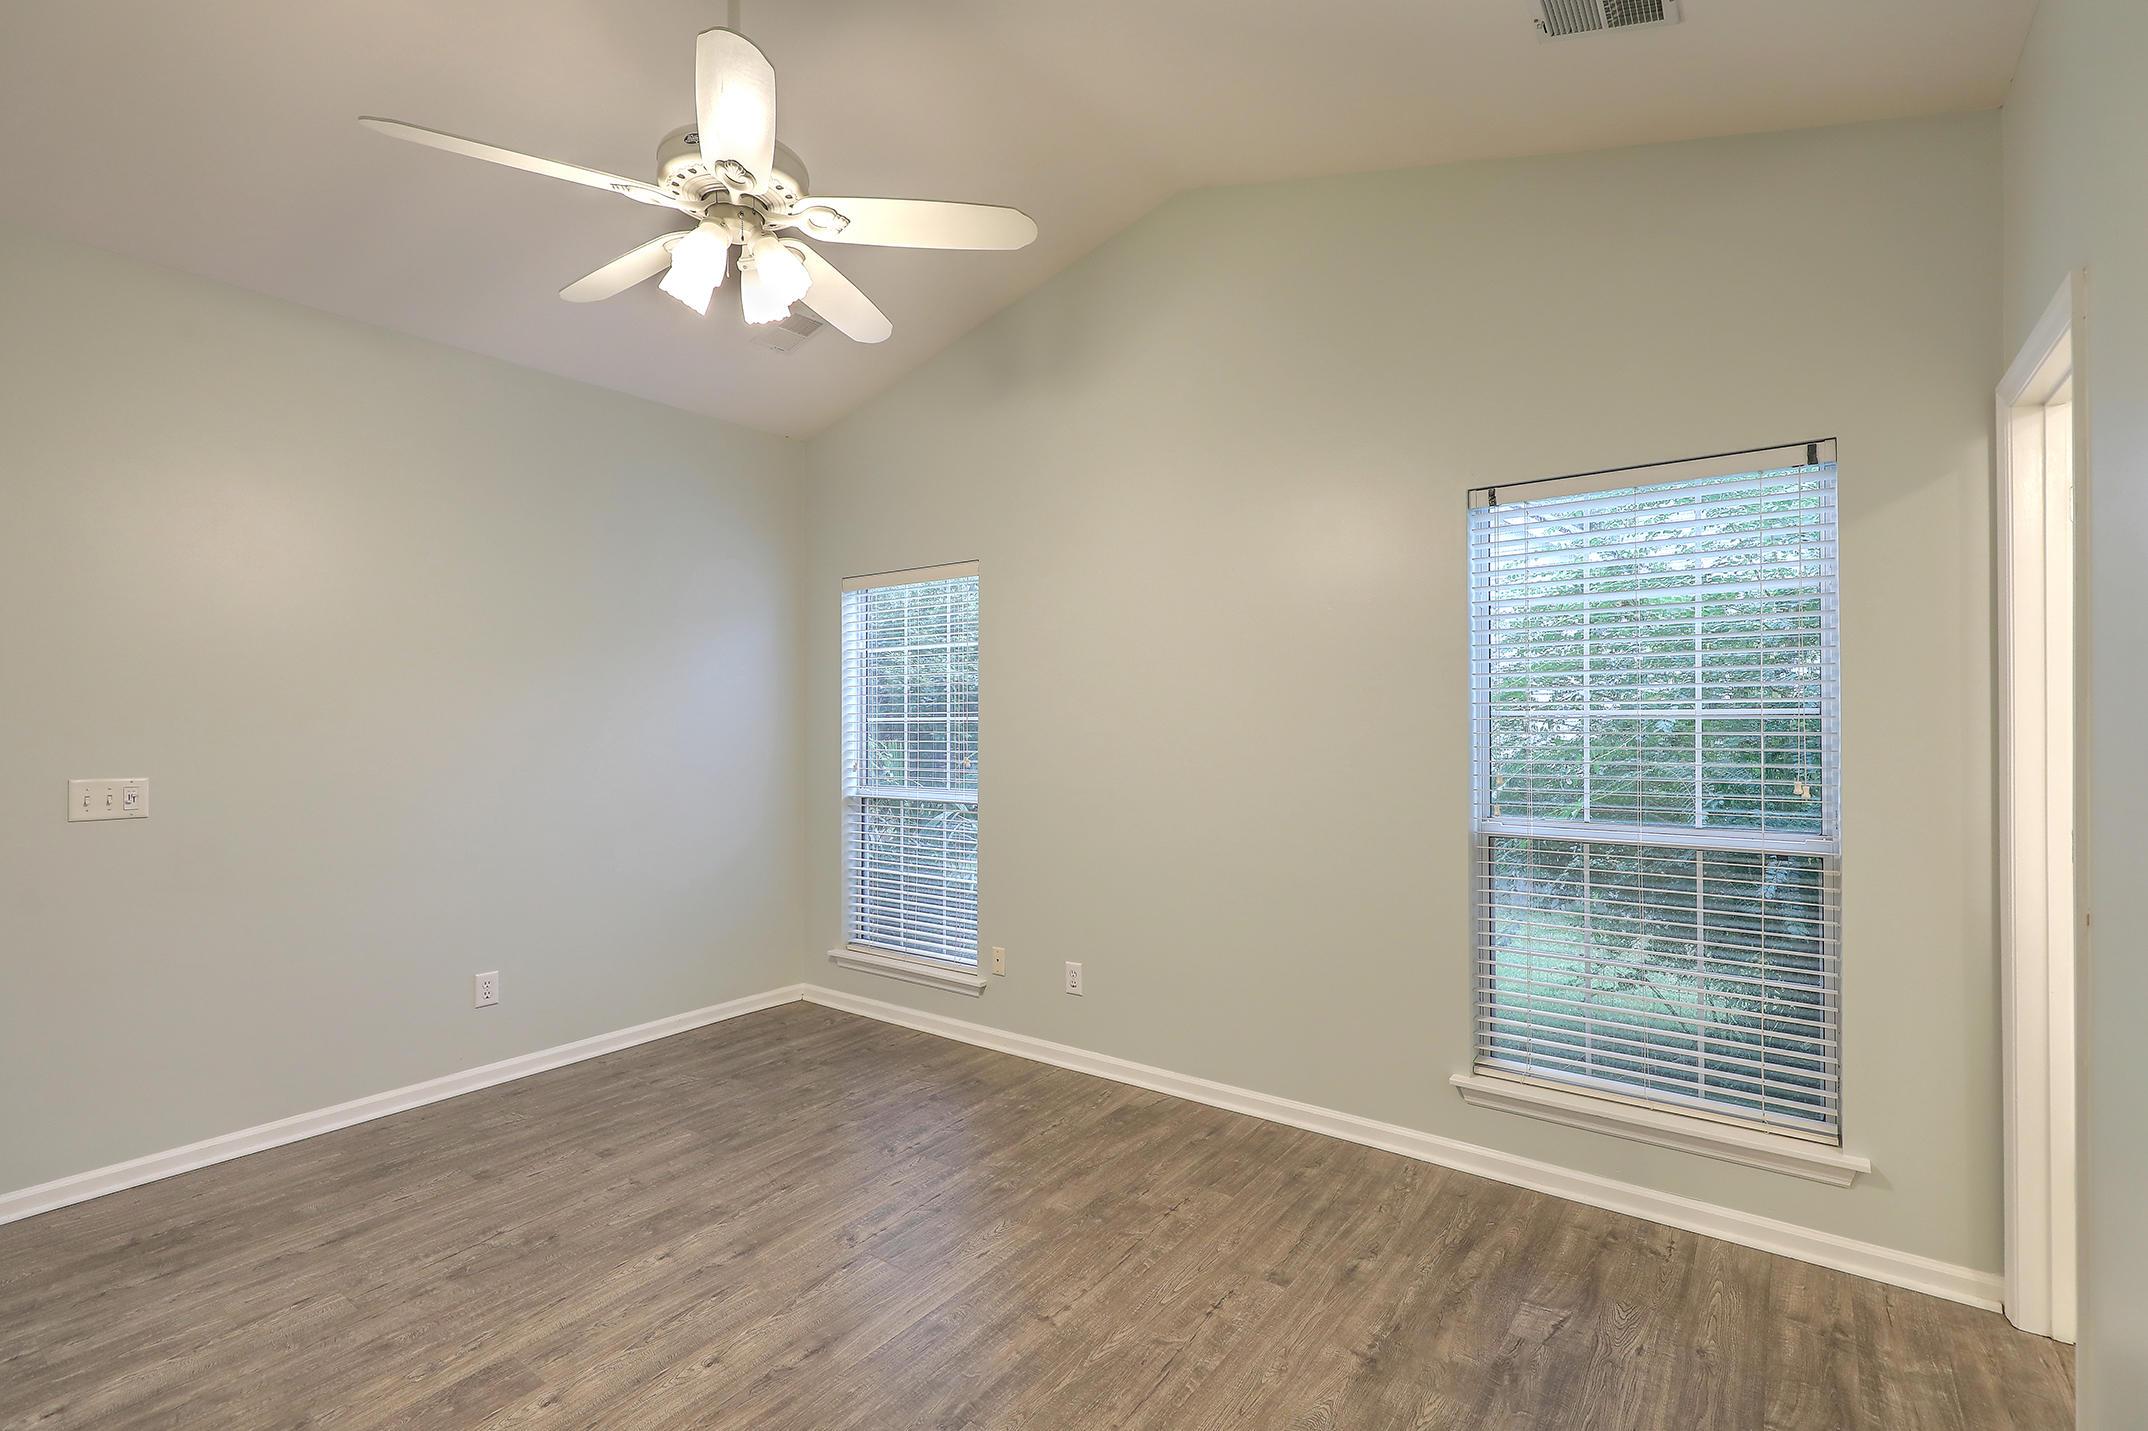 Dunes West Homes For Sale - 1309 Sassafrass, Mount Pleasant, SC - 24